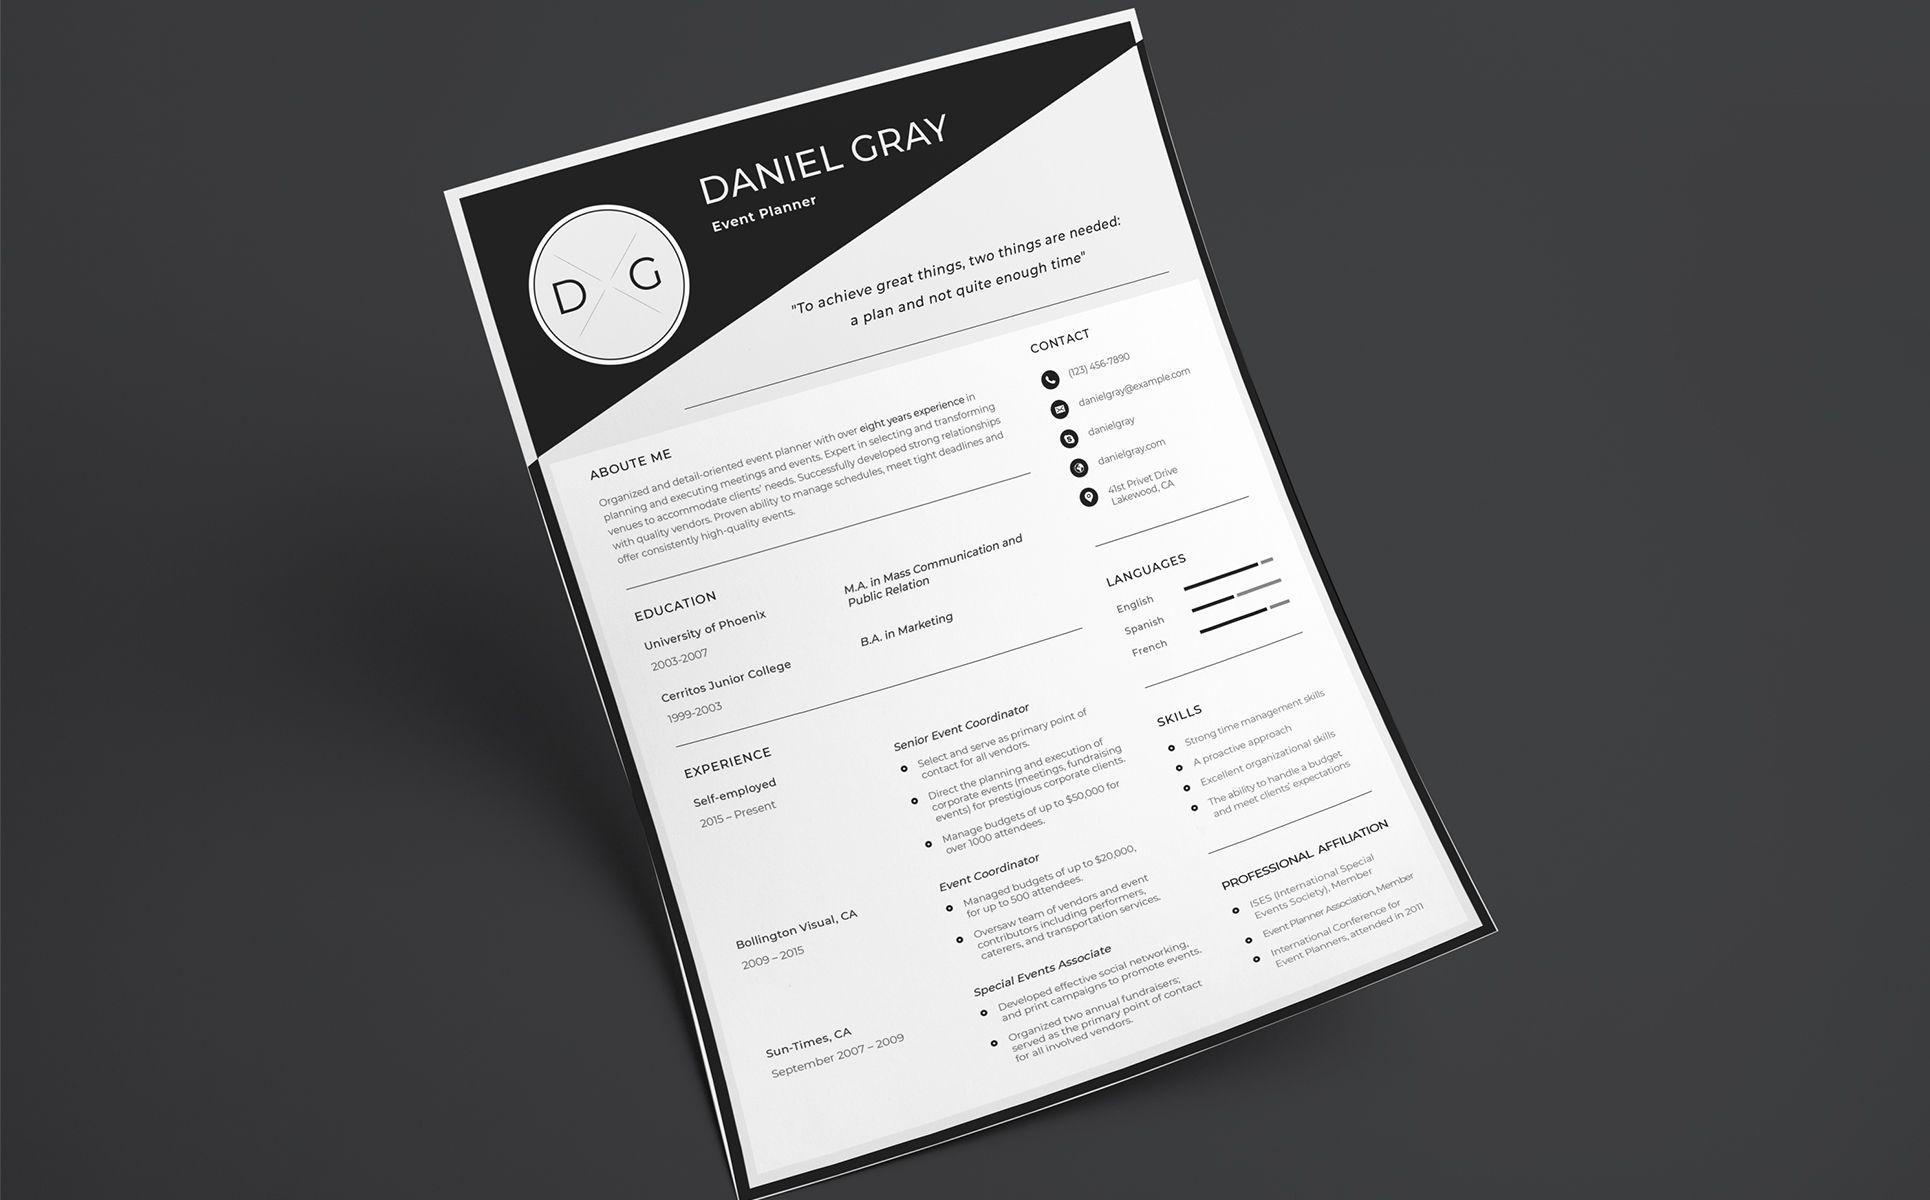 Daniel gray event planner resume template 66457 event